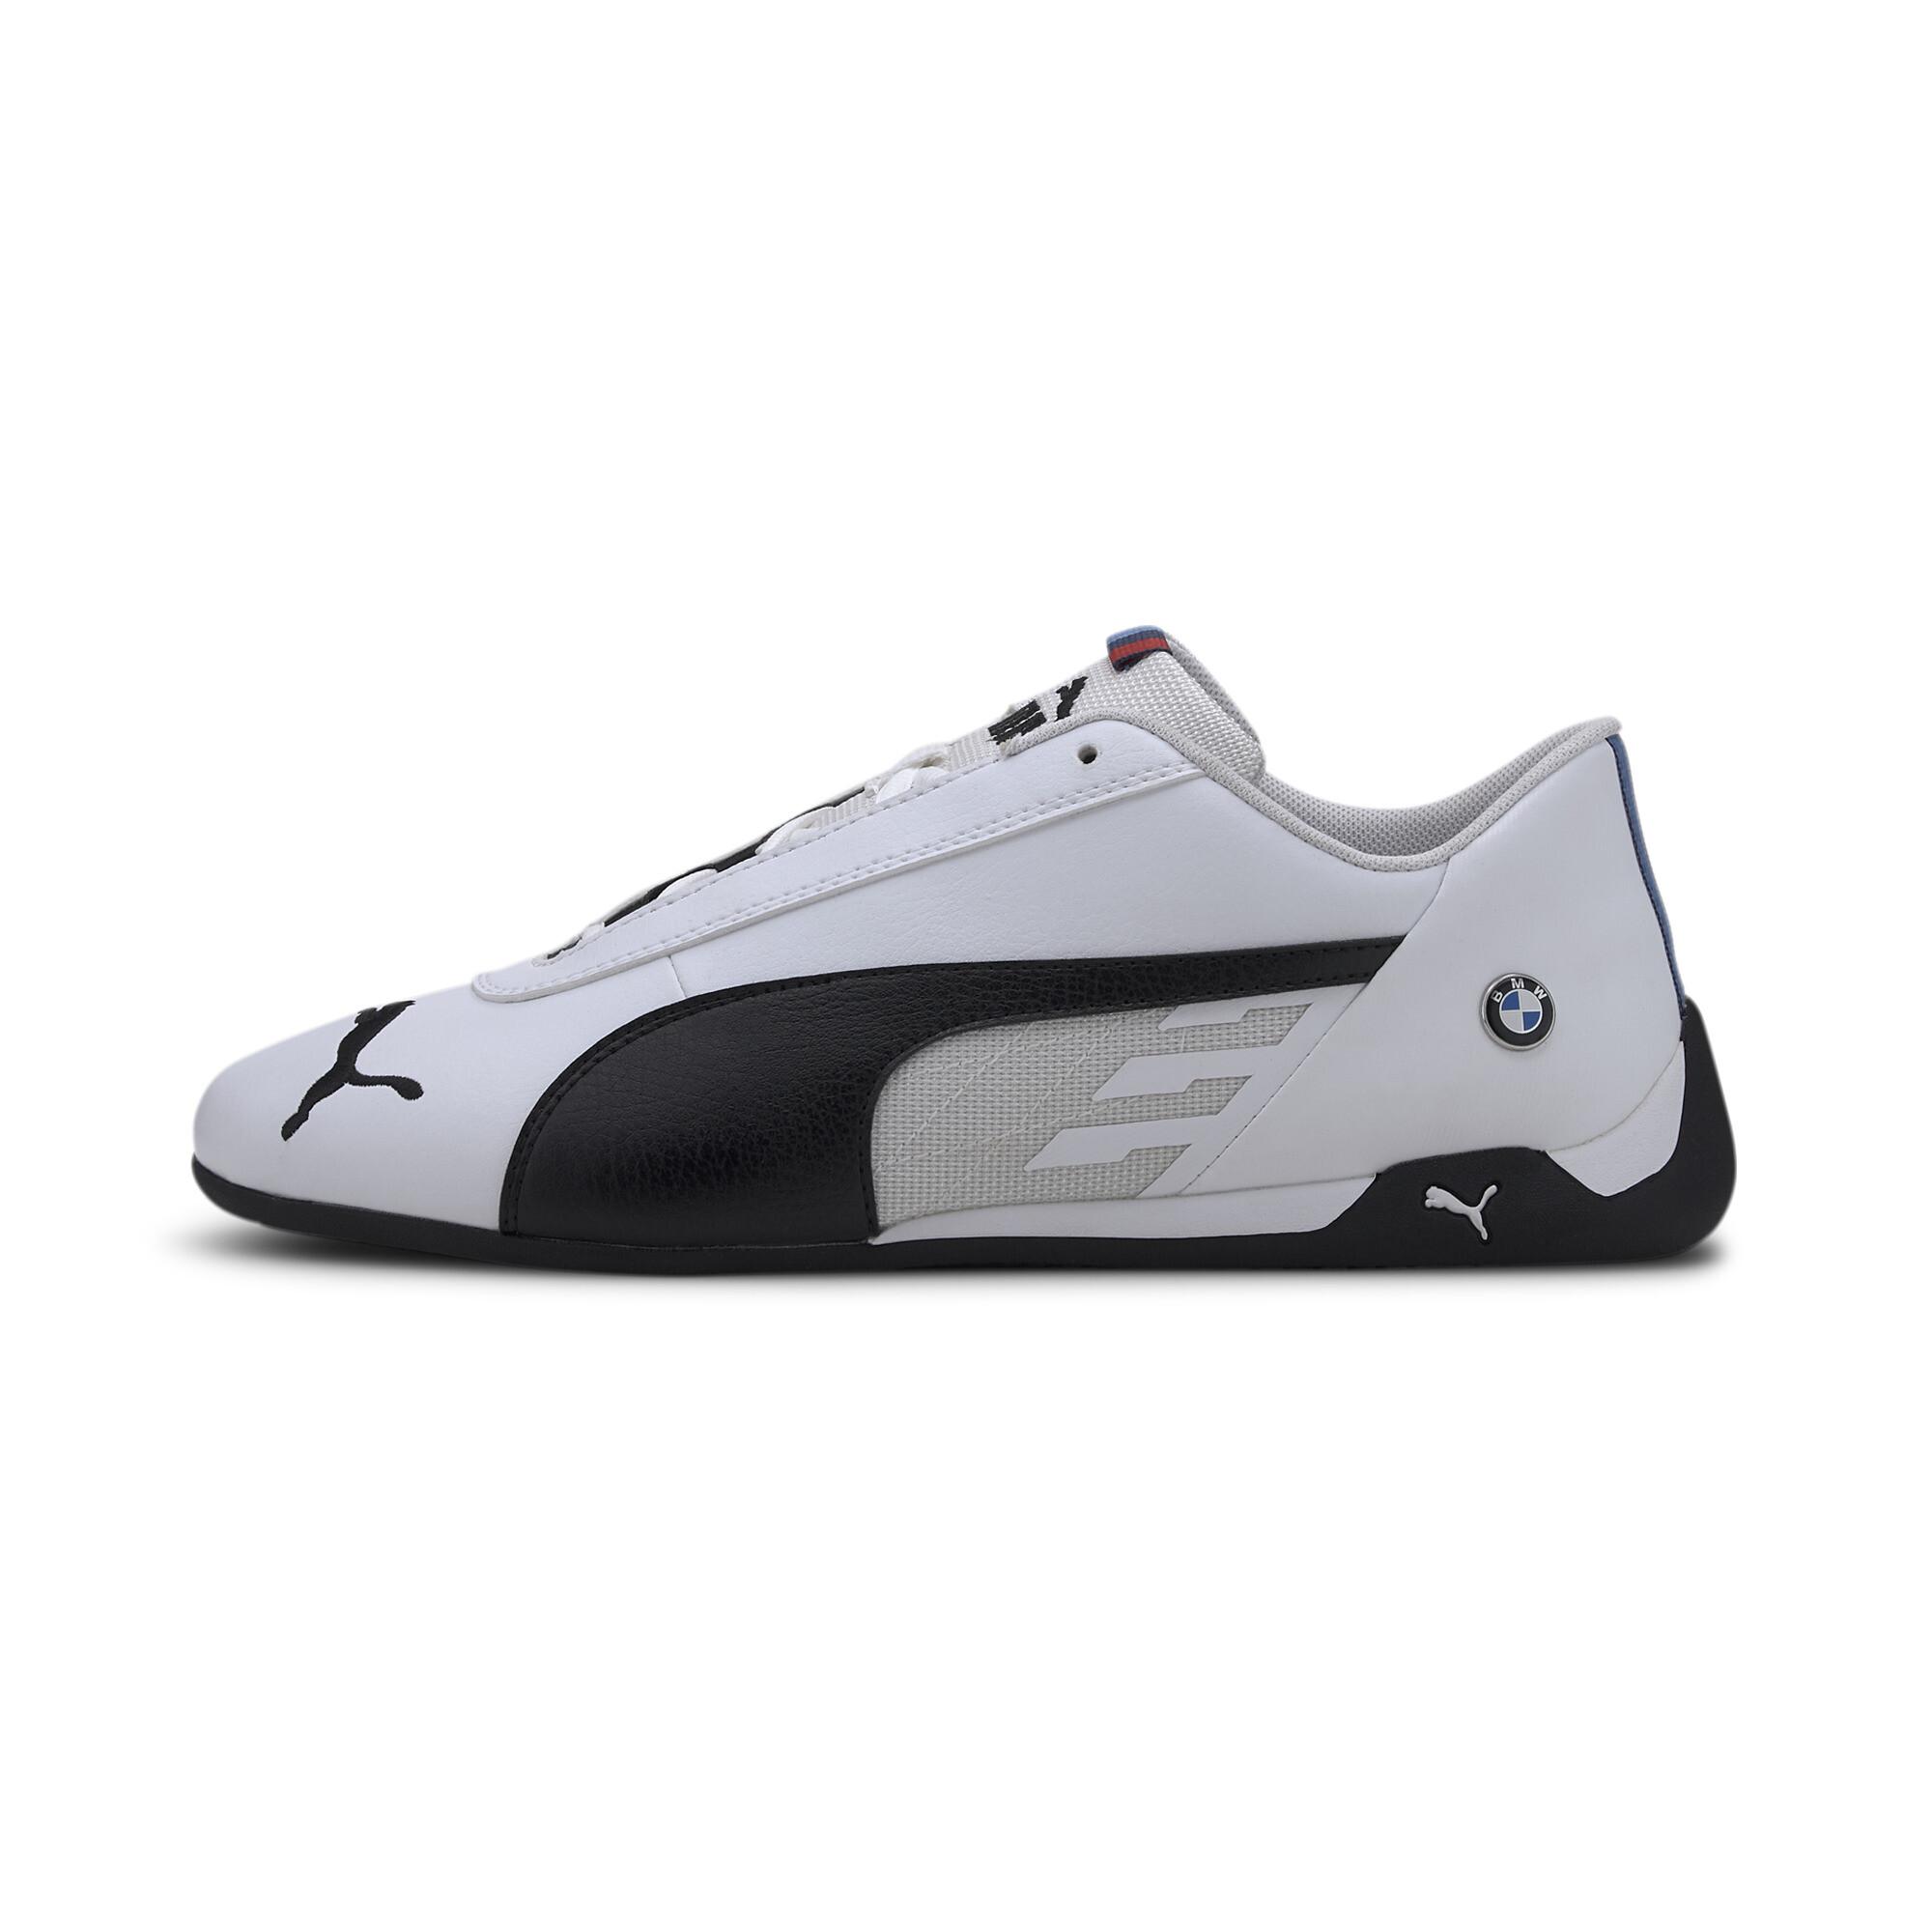 PUMA-Men-039-s-BMW-M-Motorsport-R-Cat-Motorsport-Shoes thumbnail 4